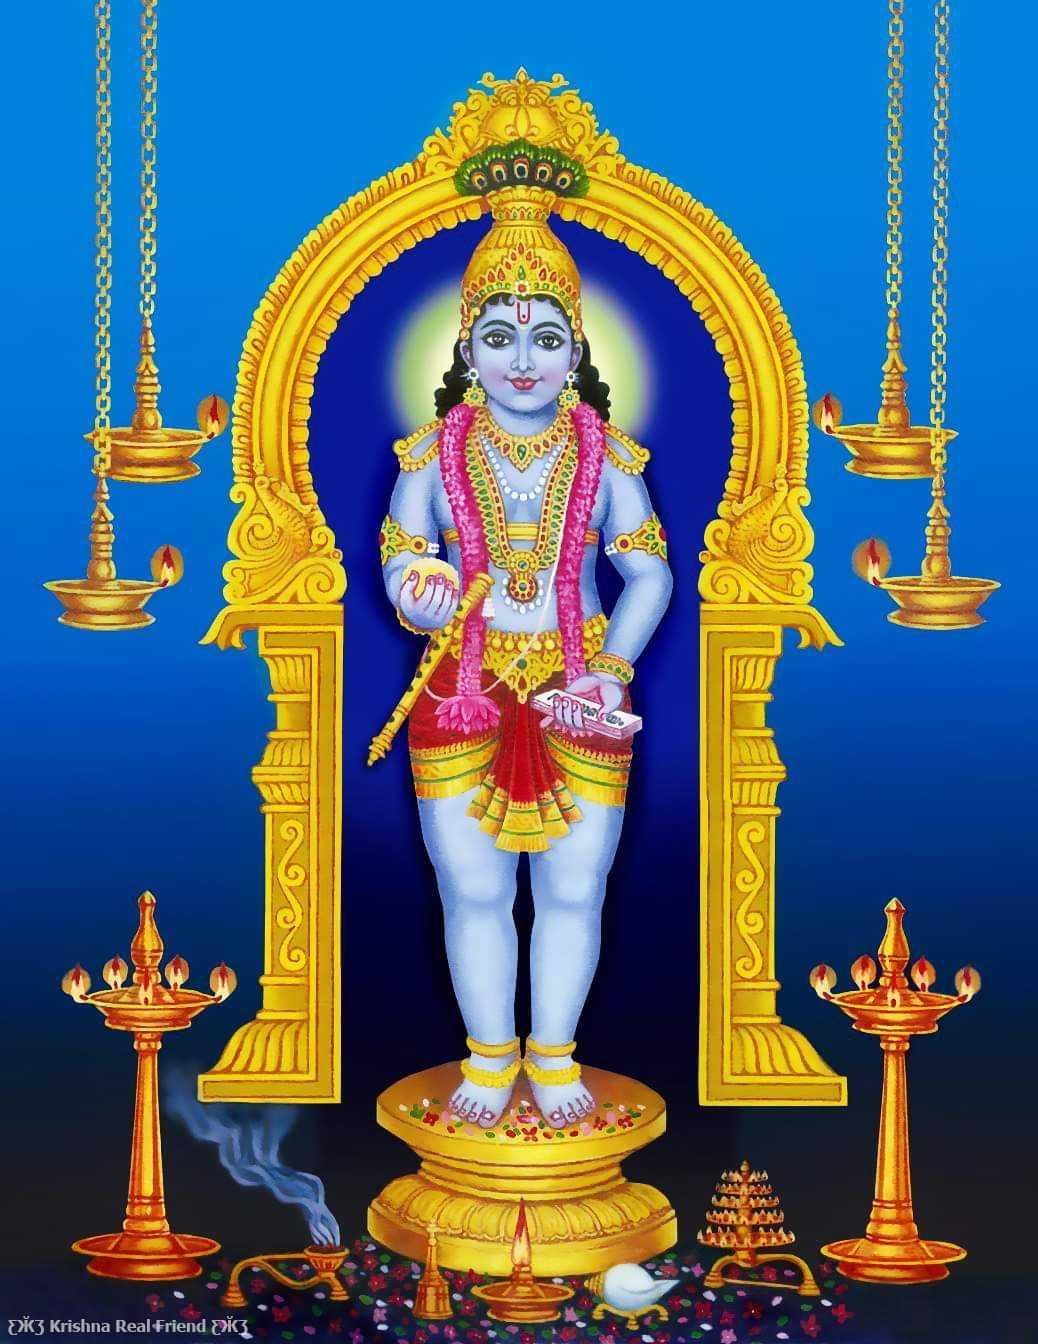 Lord Krishna Wallpapers For Desktop Mobile - Lord Krishna Wallpapers For Desktop Mobile